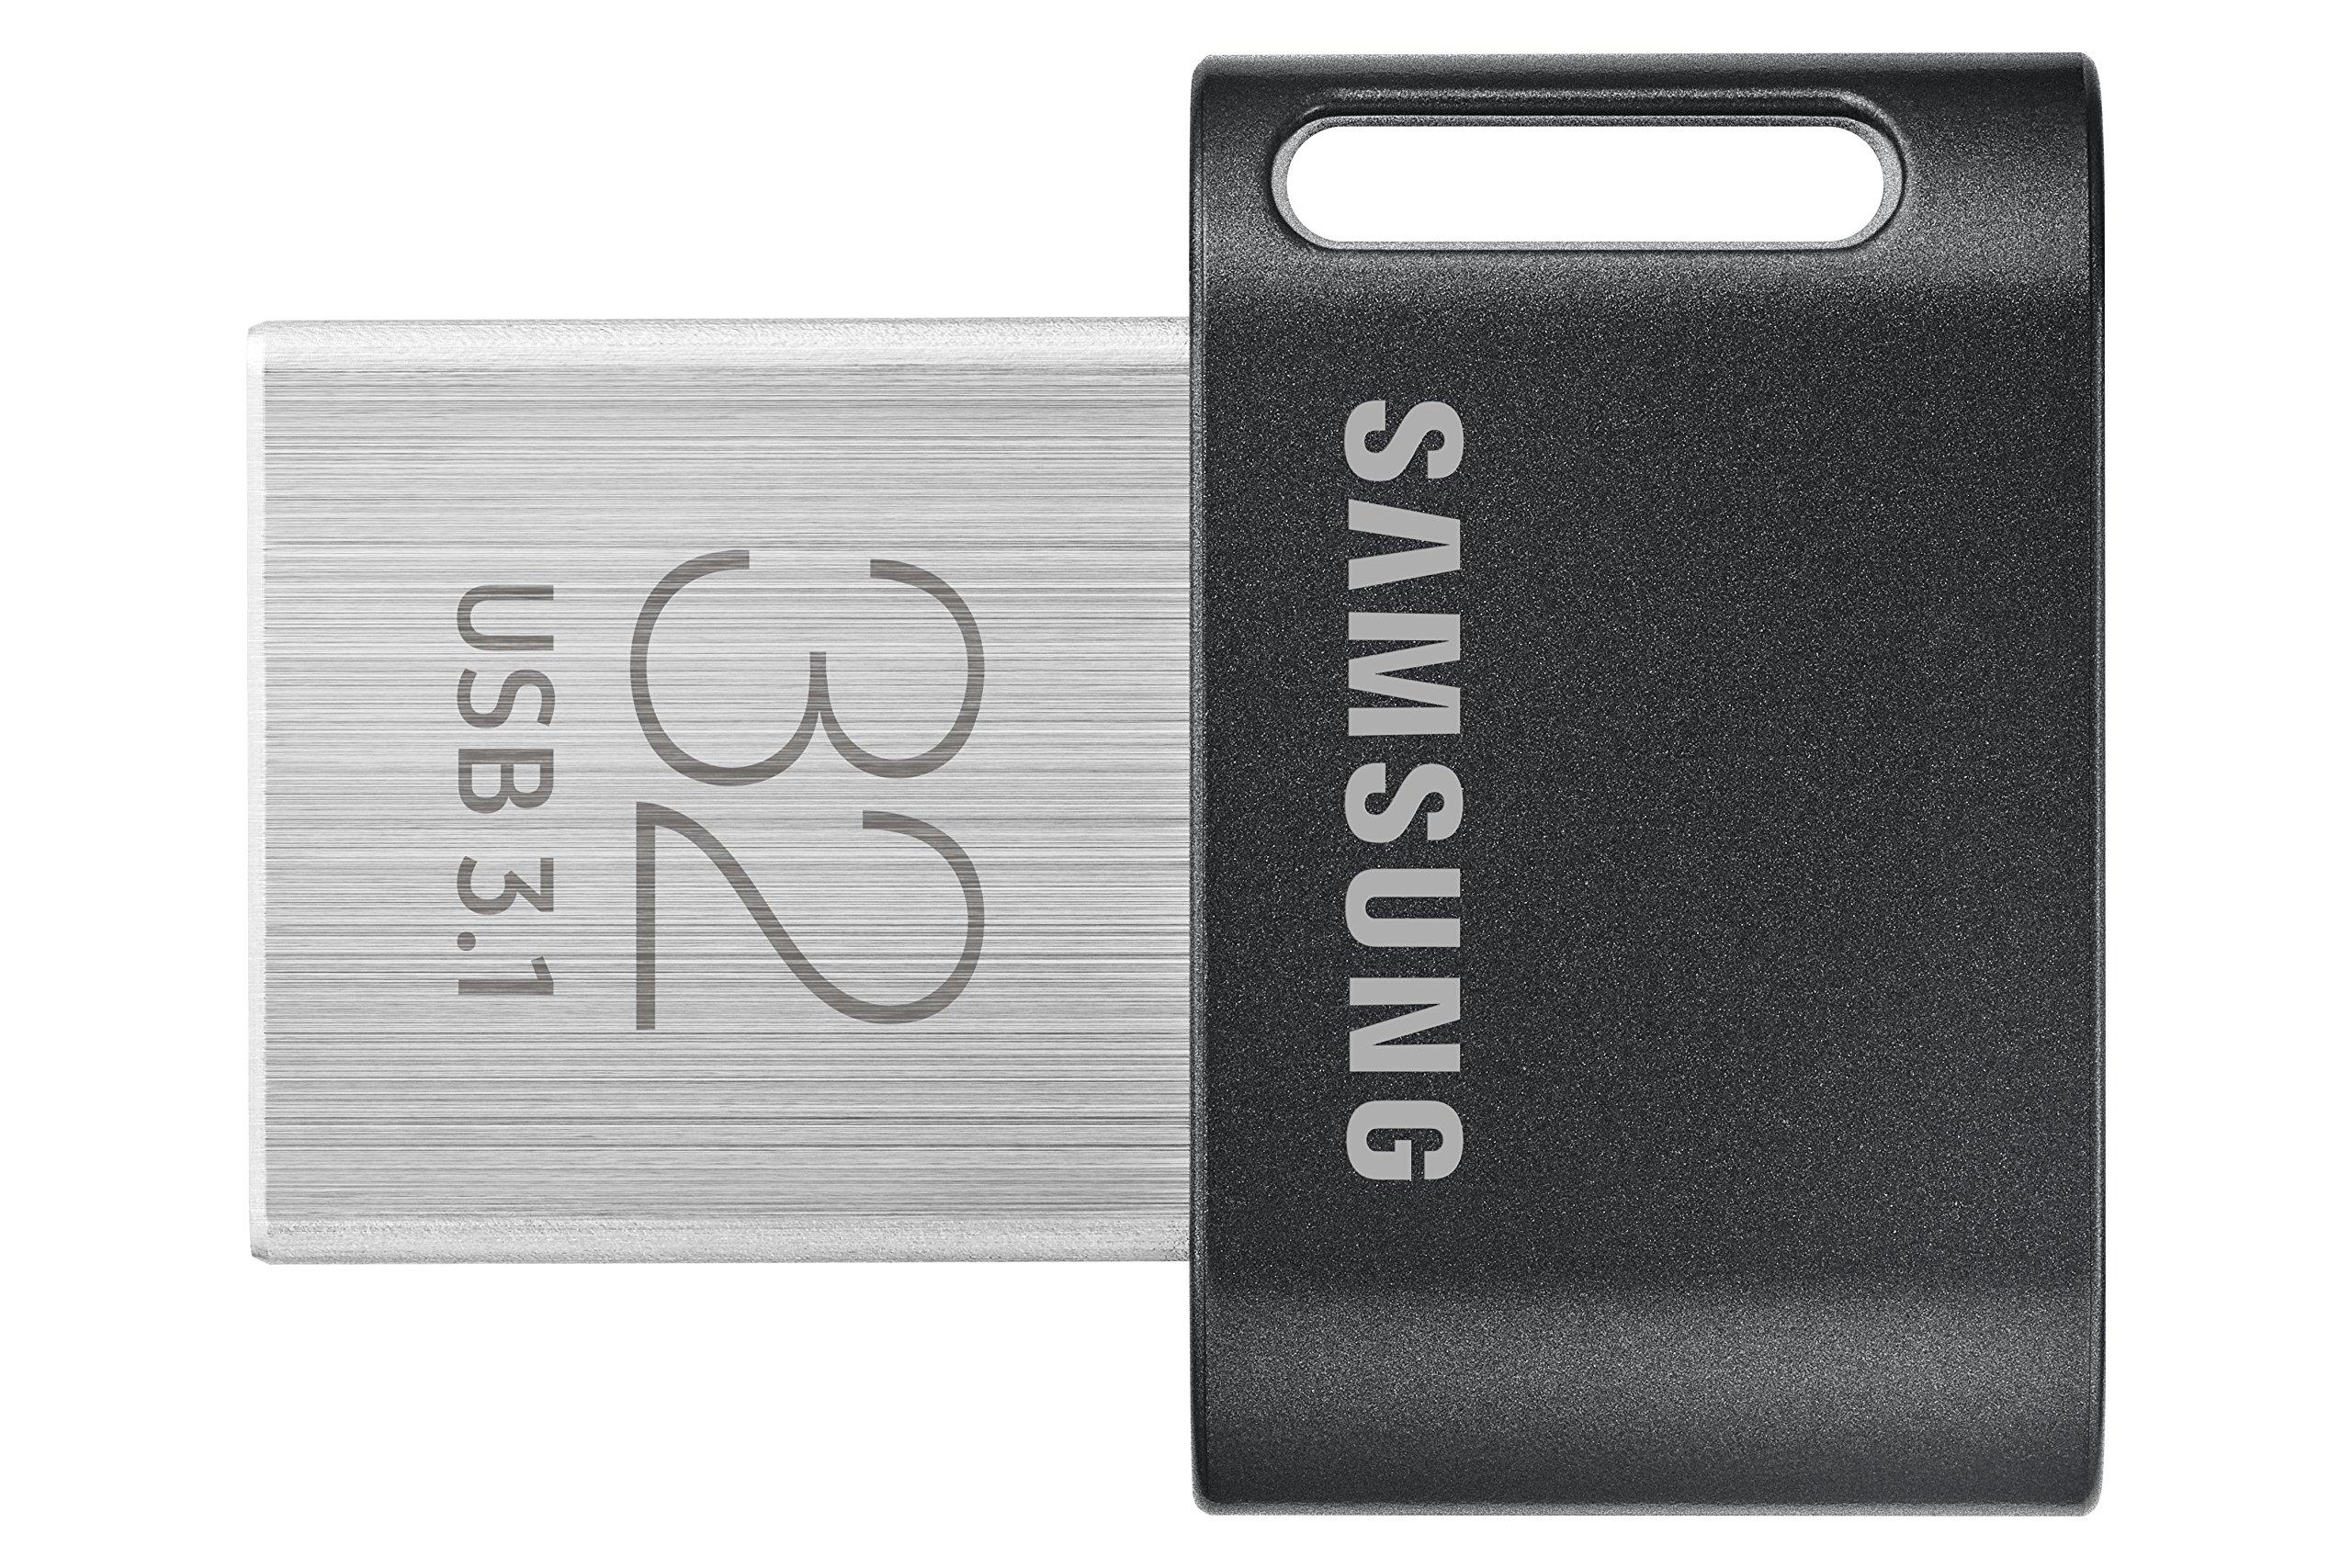 Pendrive Samsung MUF-32AB/AM FIT Plus 32GB - 200MB/s USB 3.1